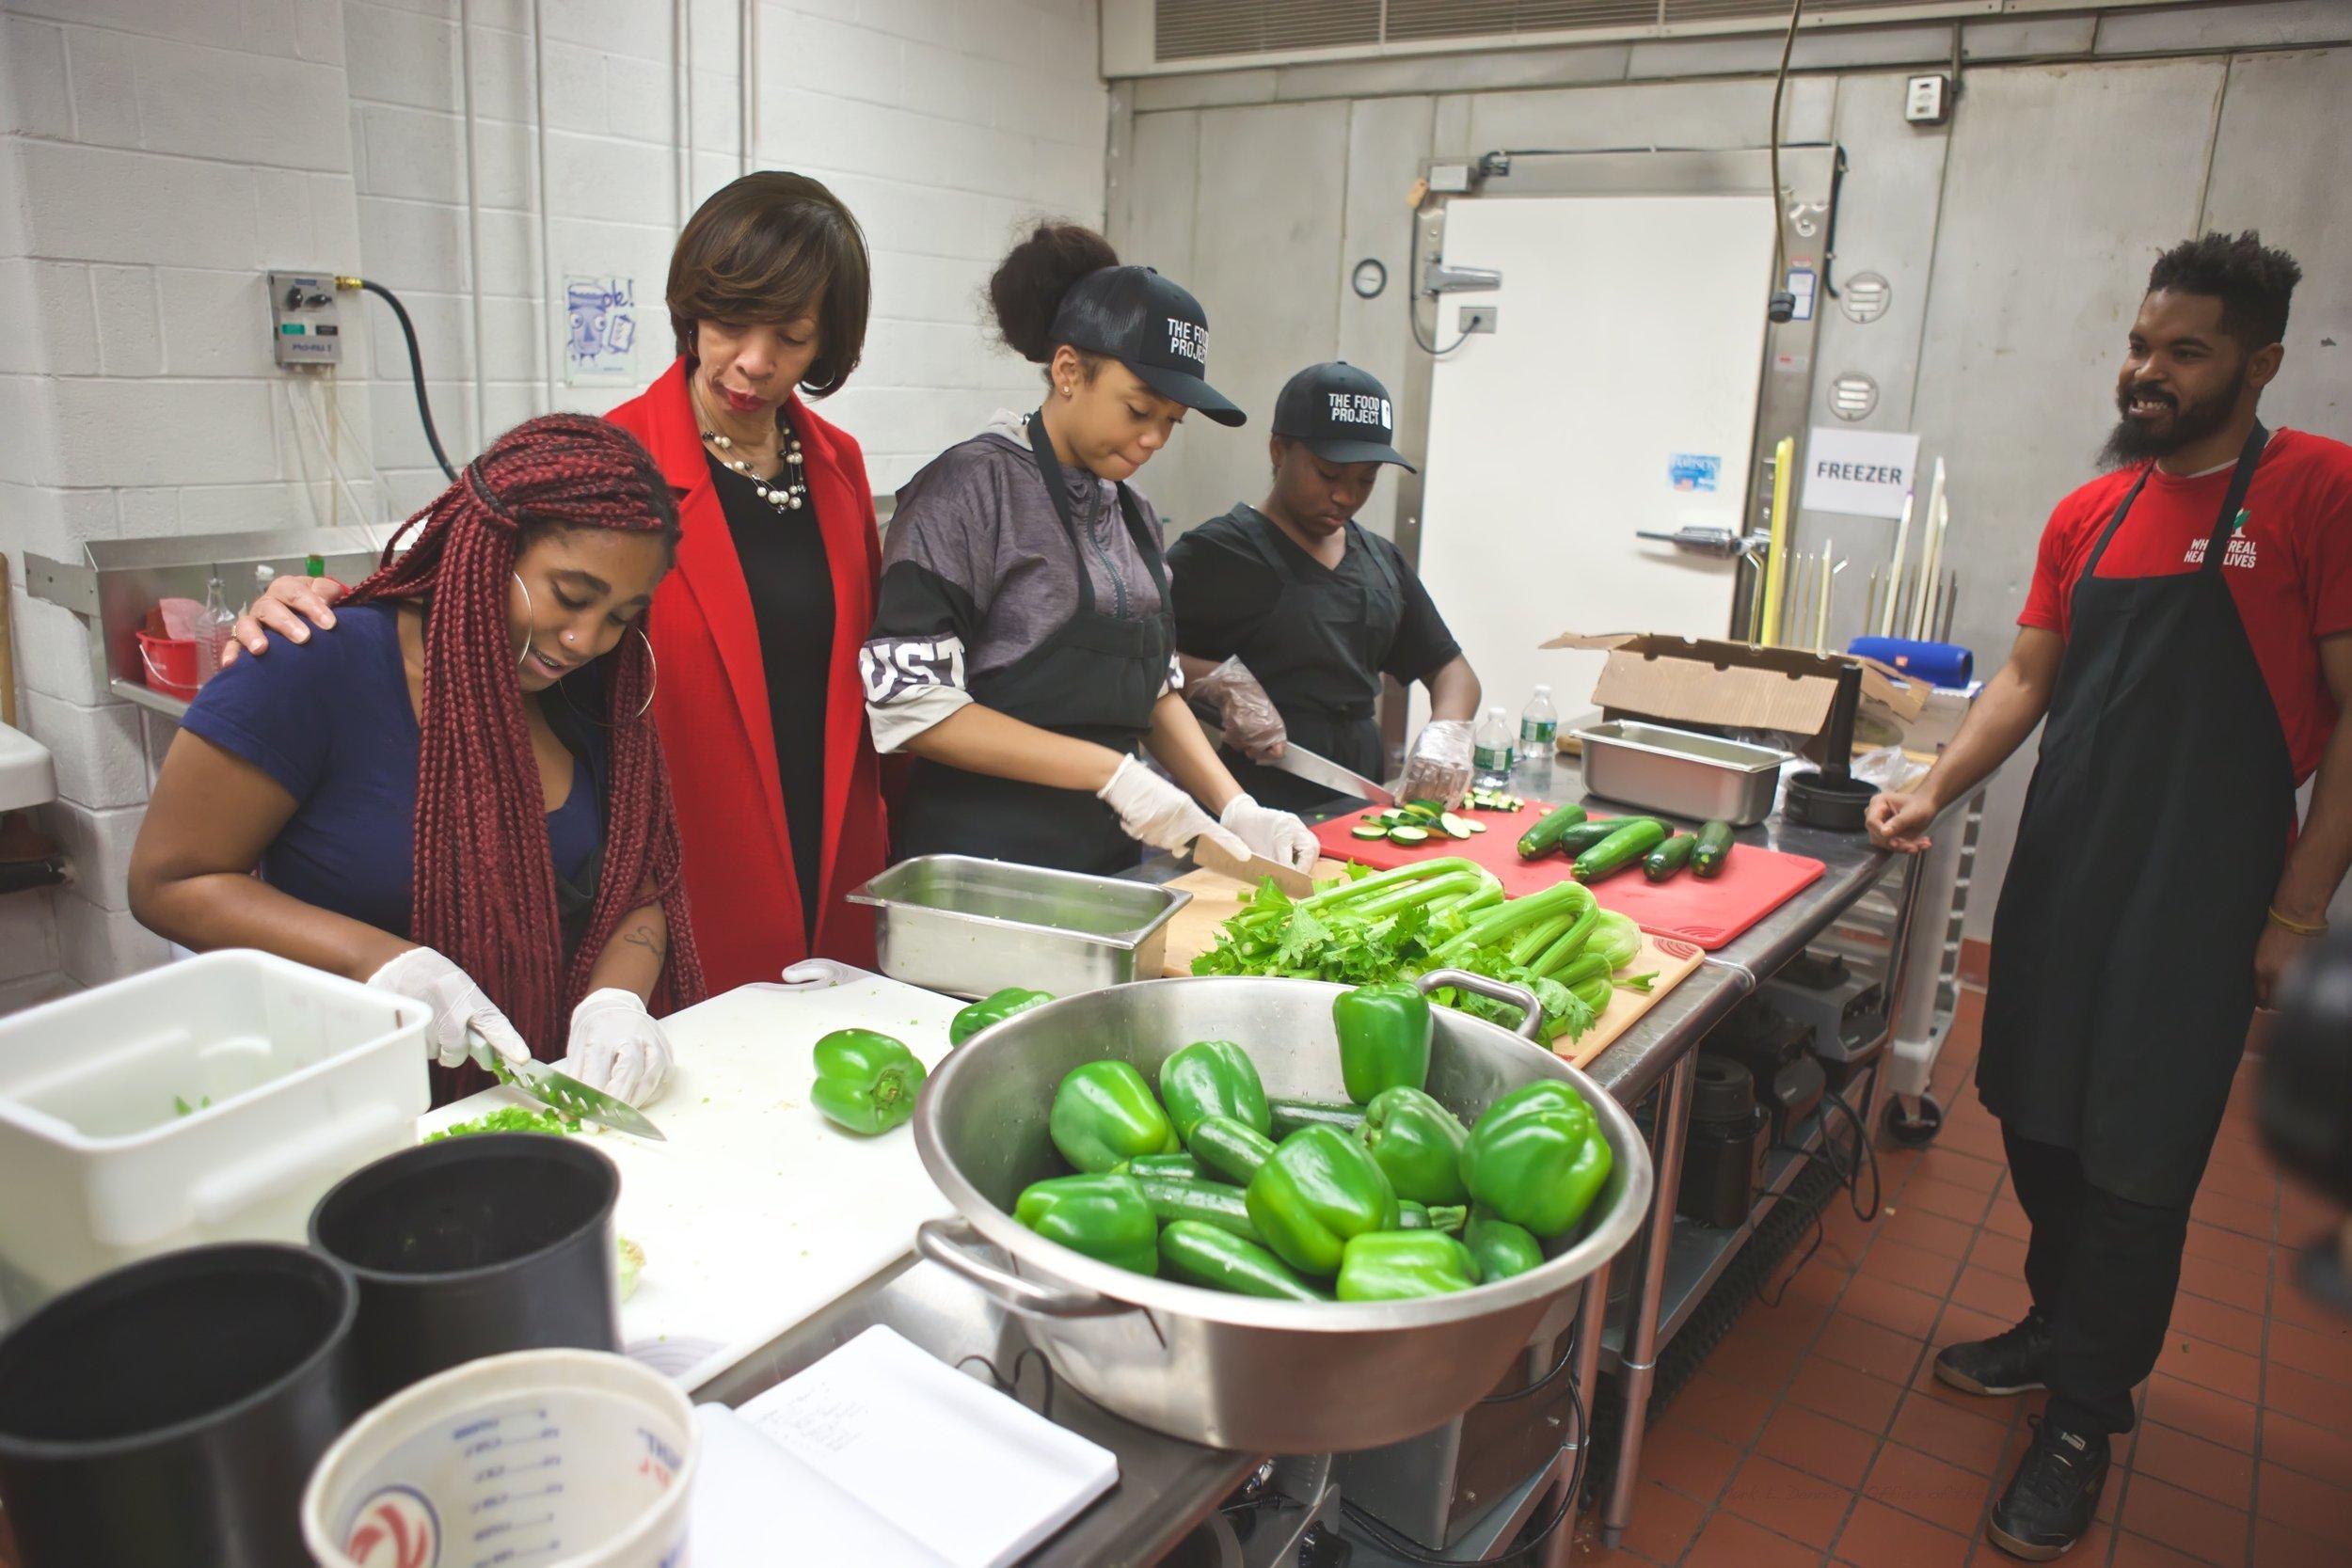 January 26, 2019 - Site visit to The Food Project, 424 S. Pulaski Street 2019-01-26 (11).jpg